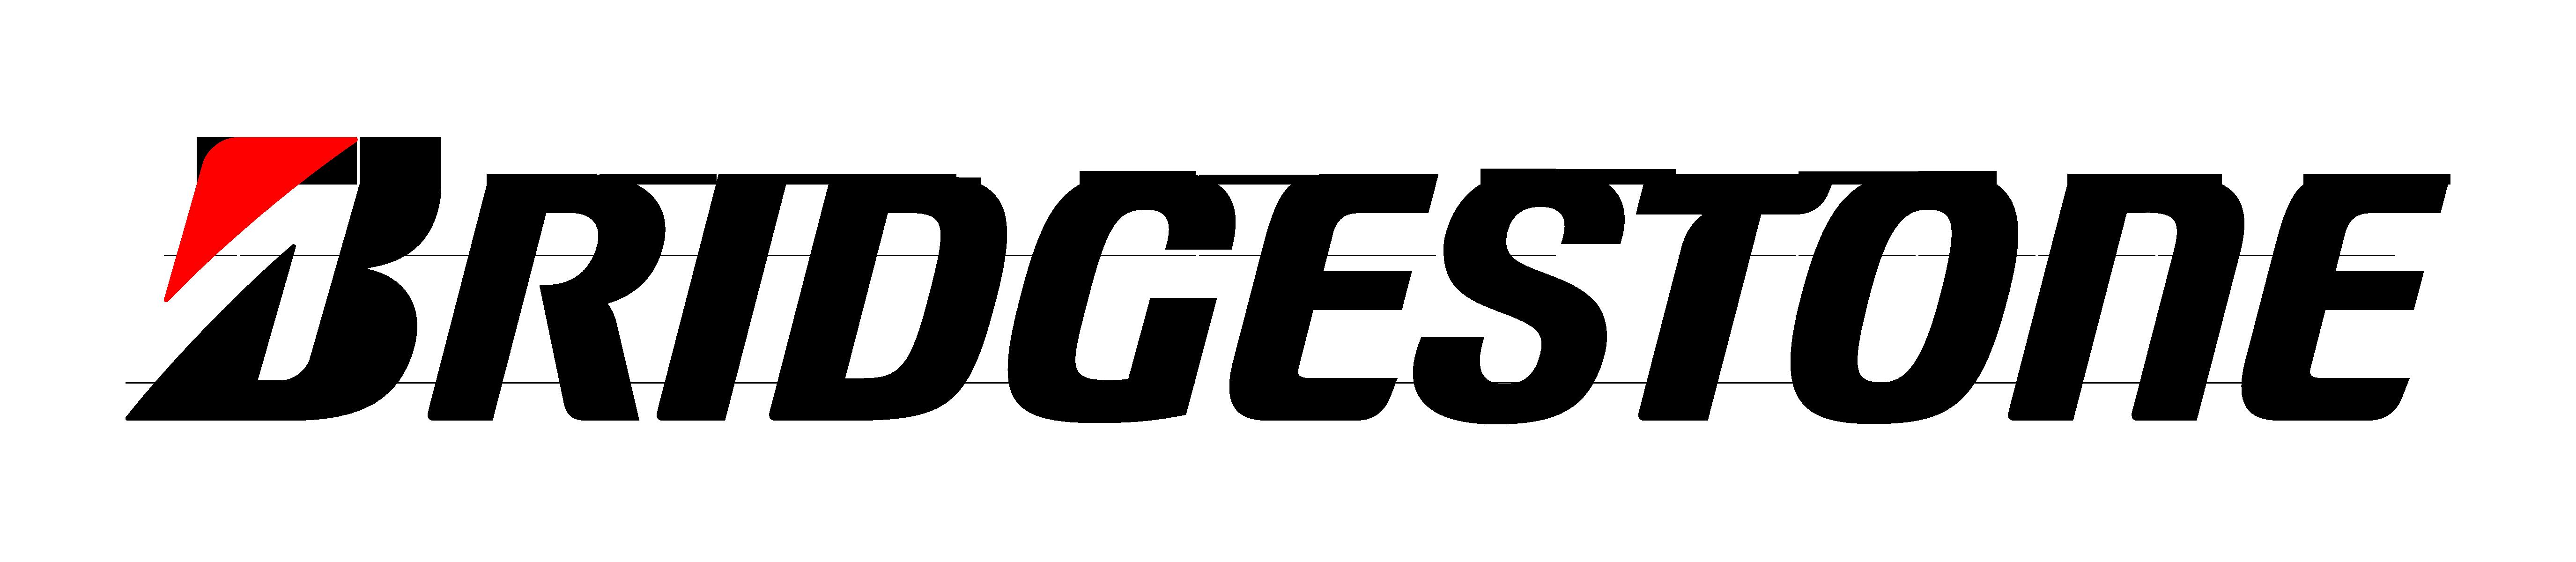 bridgestone-logo-5500x1200